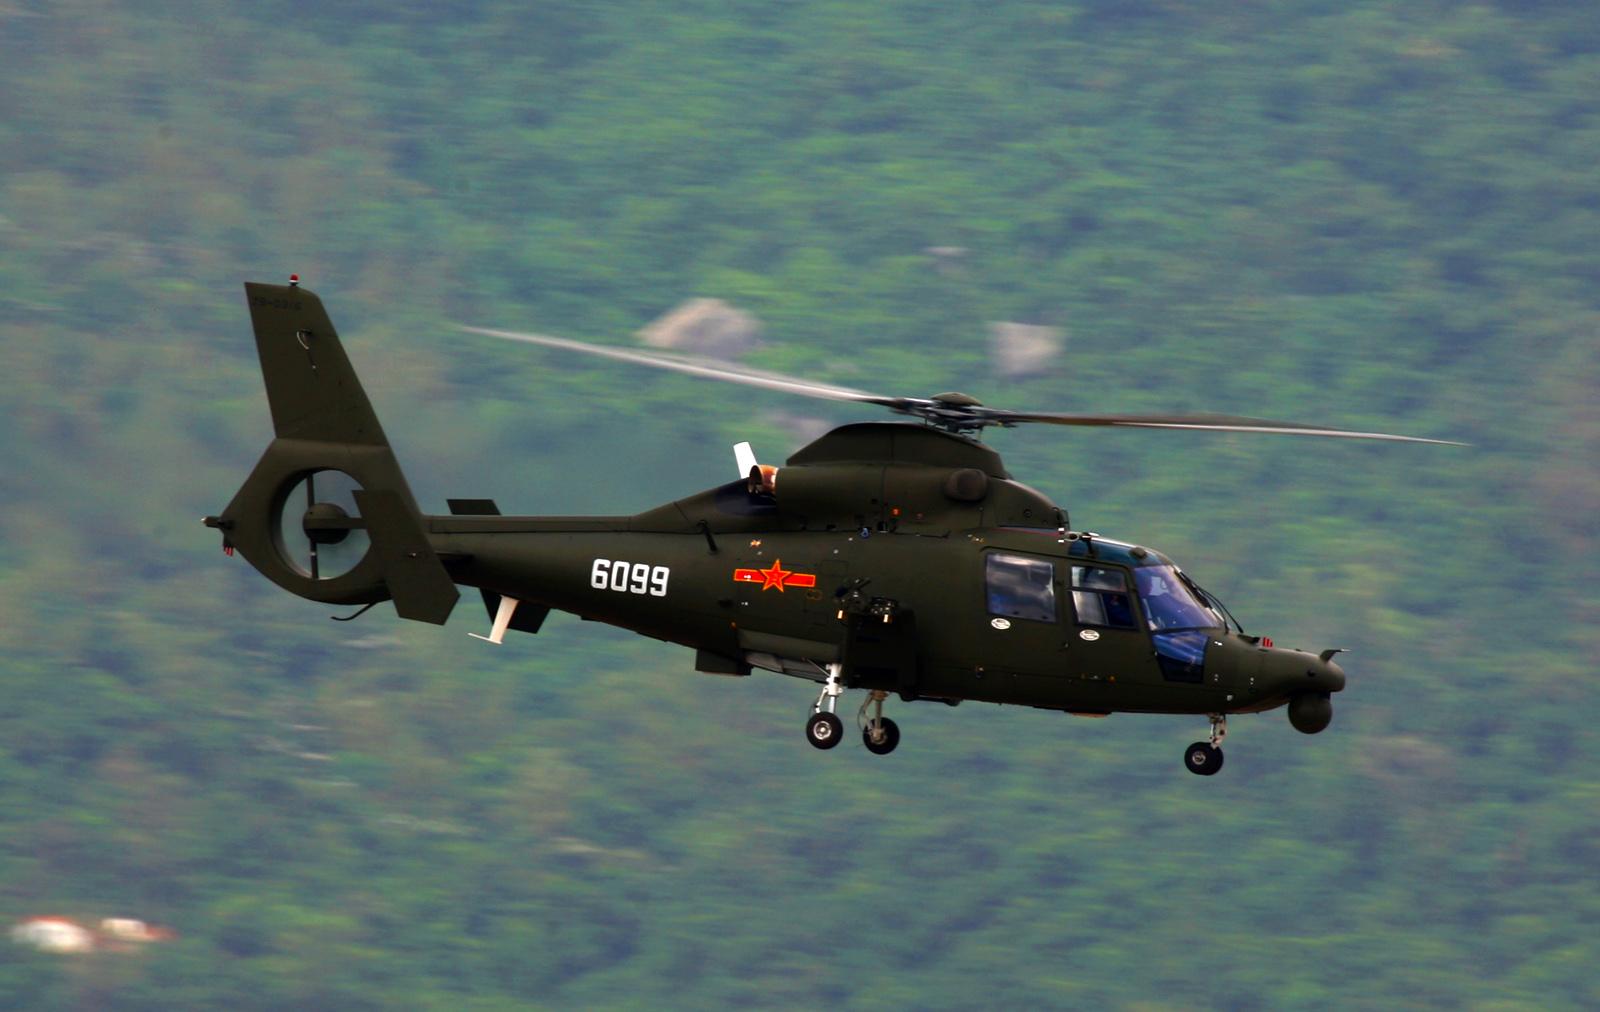 http://2.bp.blogspot.com/-CMnHKgZuZjA/T8jmjZ5gmtI/AAAAAAAAIv4/rlNLMDIdc2w/s1600/zhongdui_chinese_chopper.jpg